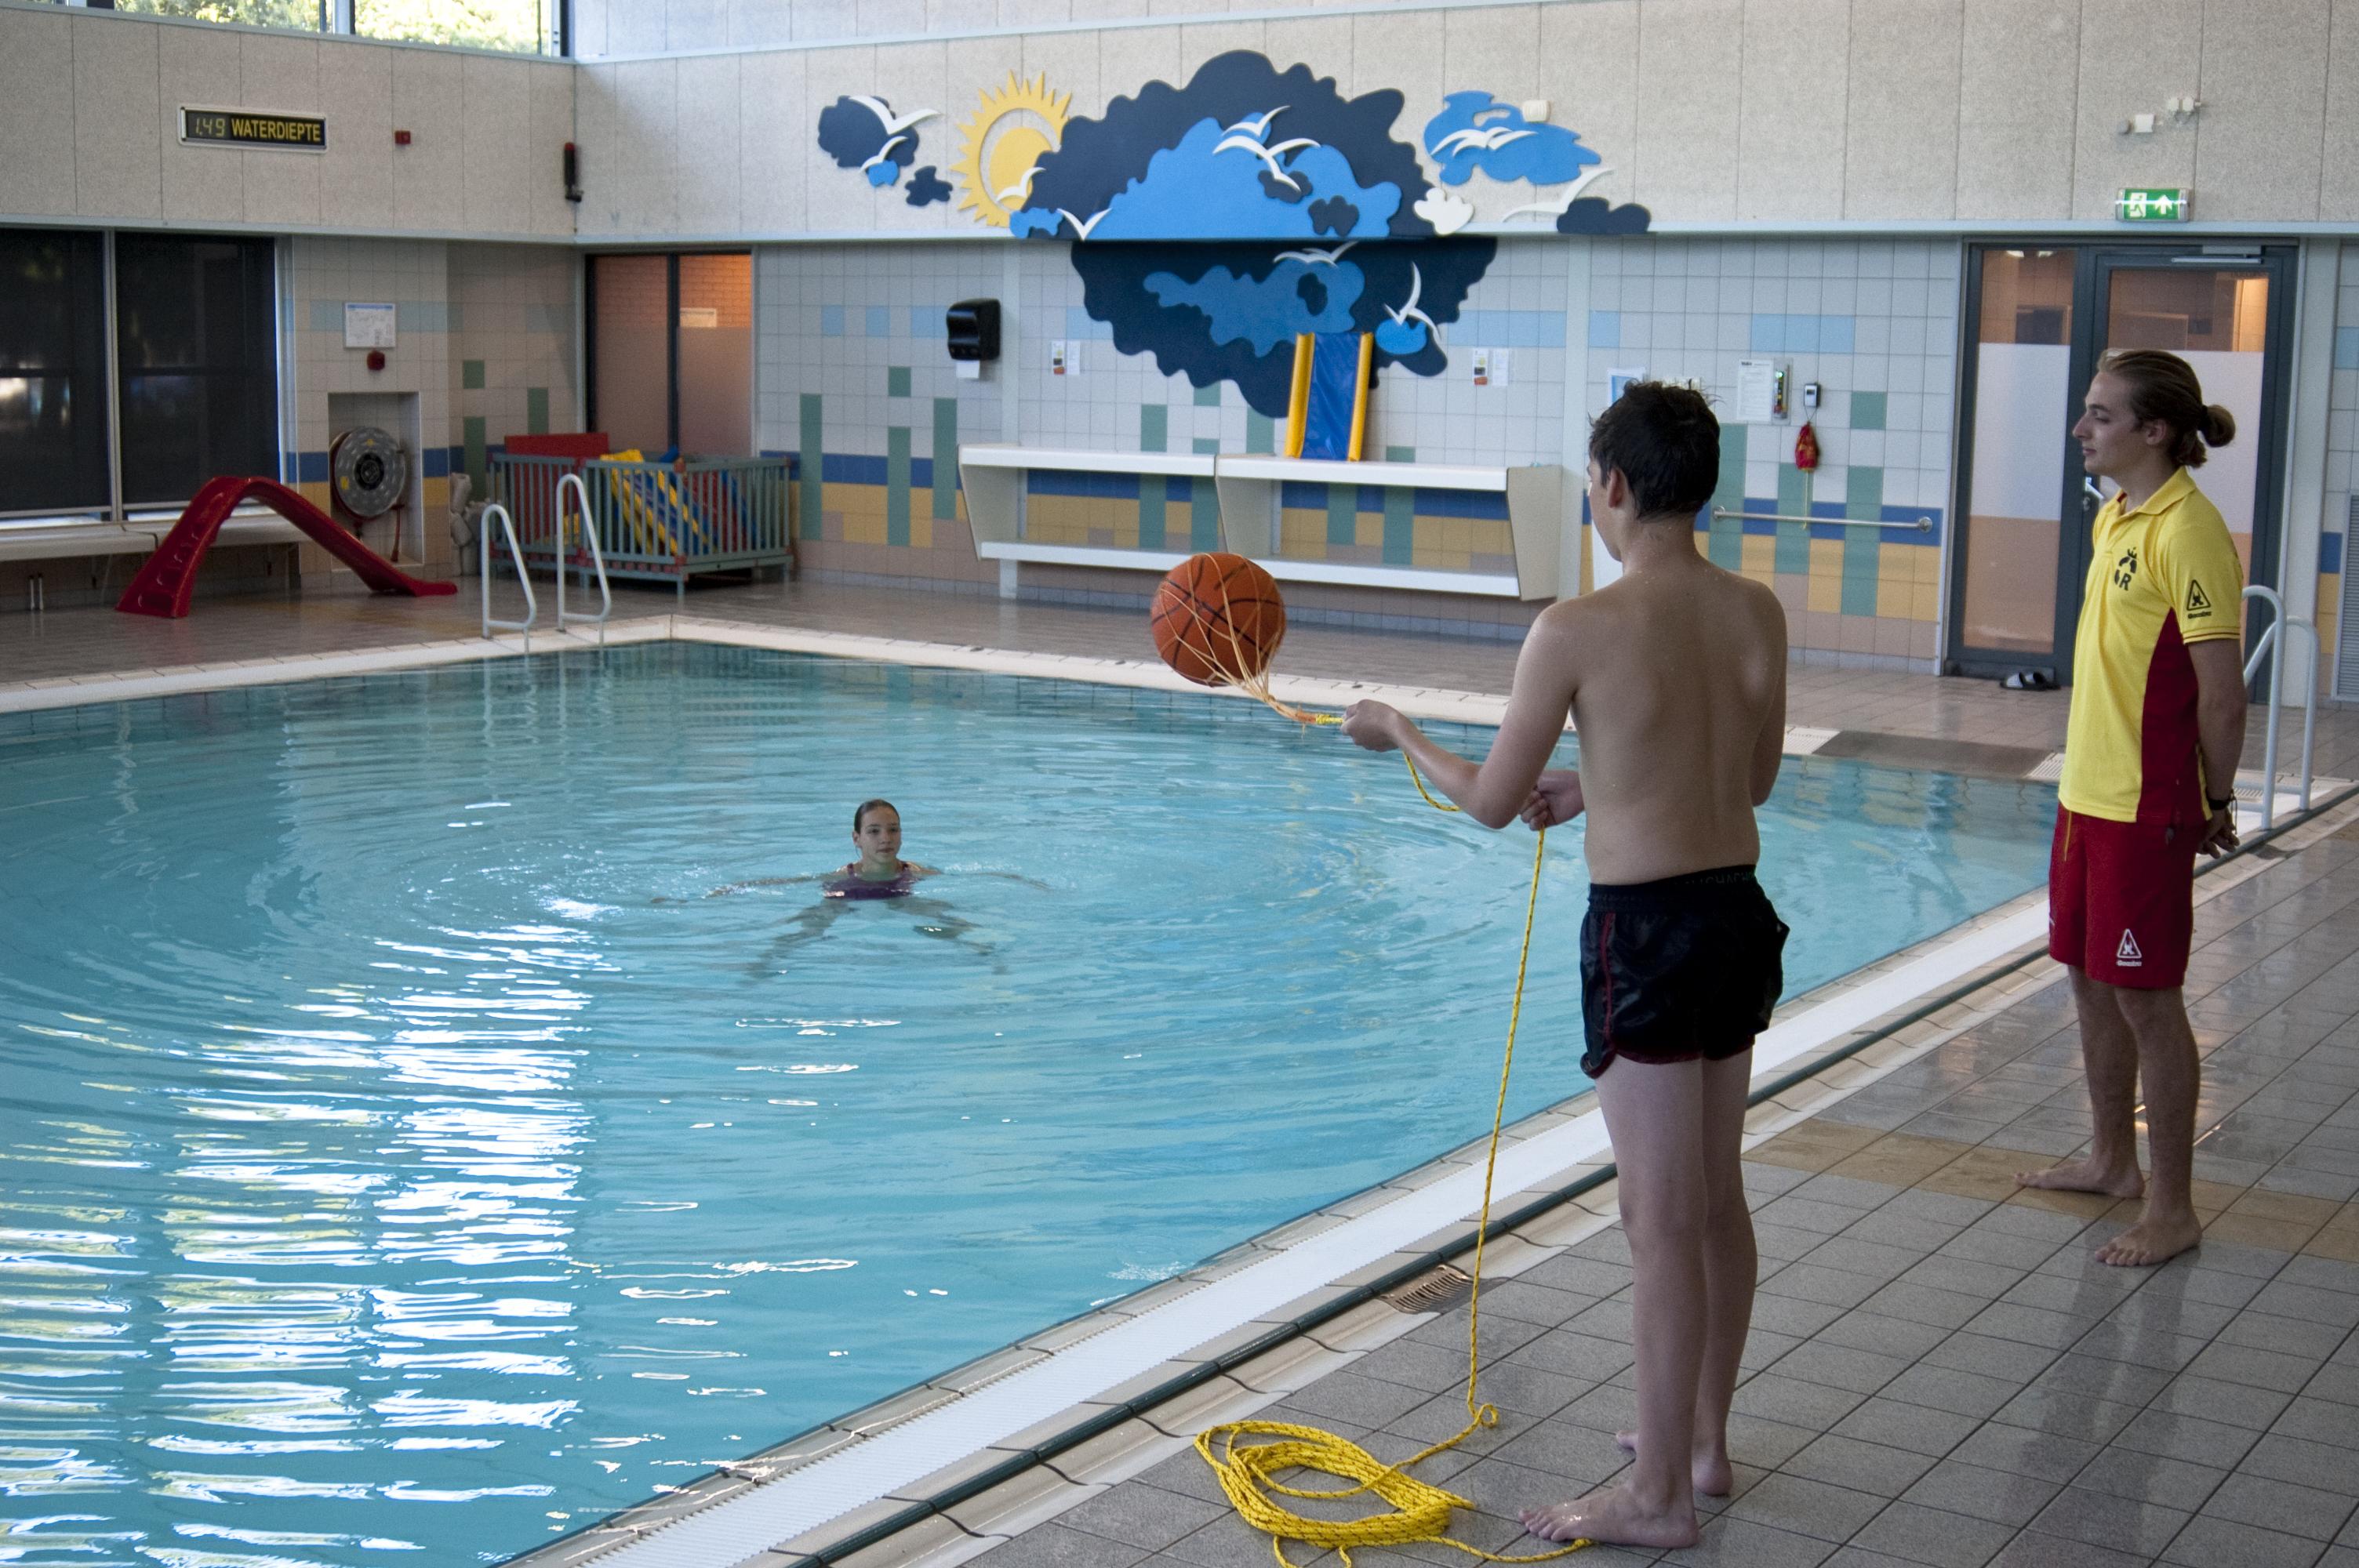 Zwemmen bij de IJmuider Reddingsbrigade - Lifeguard in opleiding - Zwemmen na je ABC-diploma's